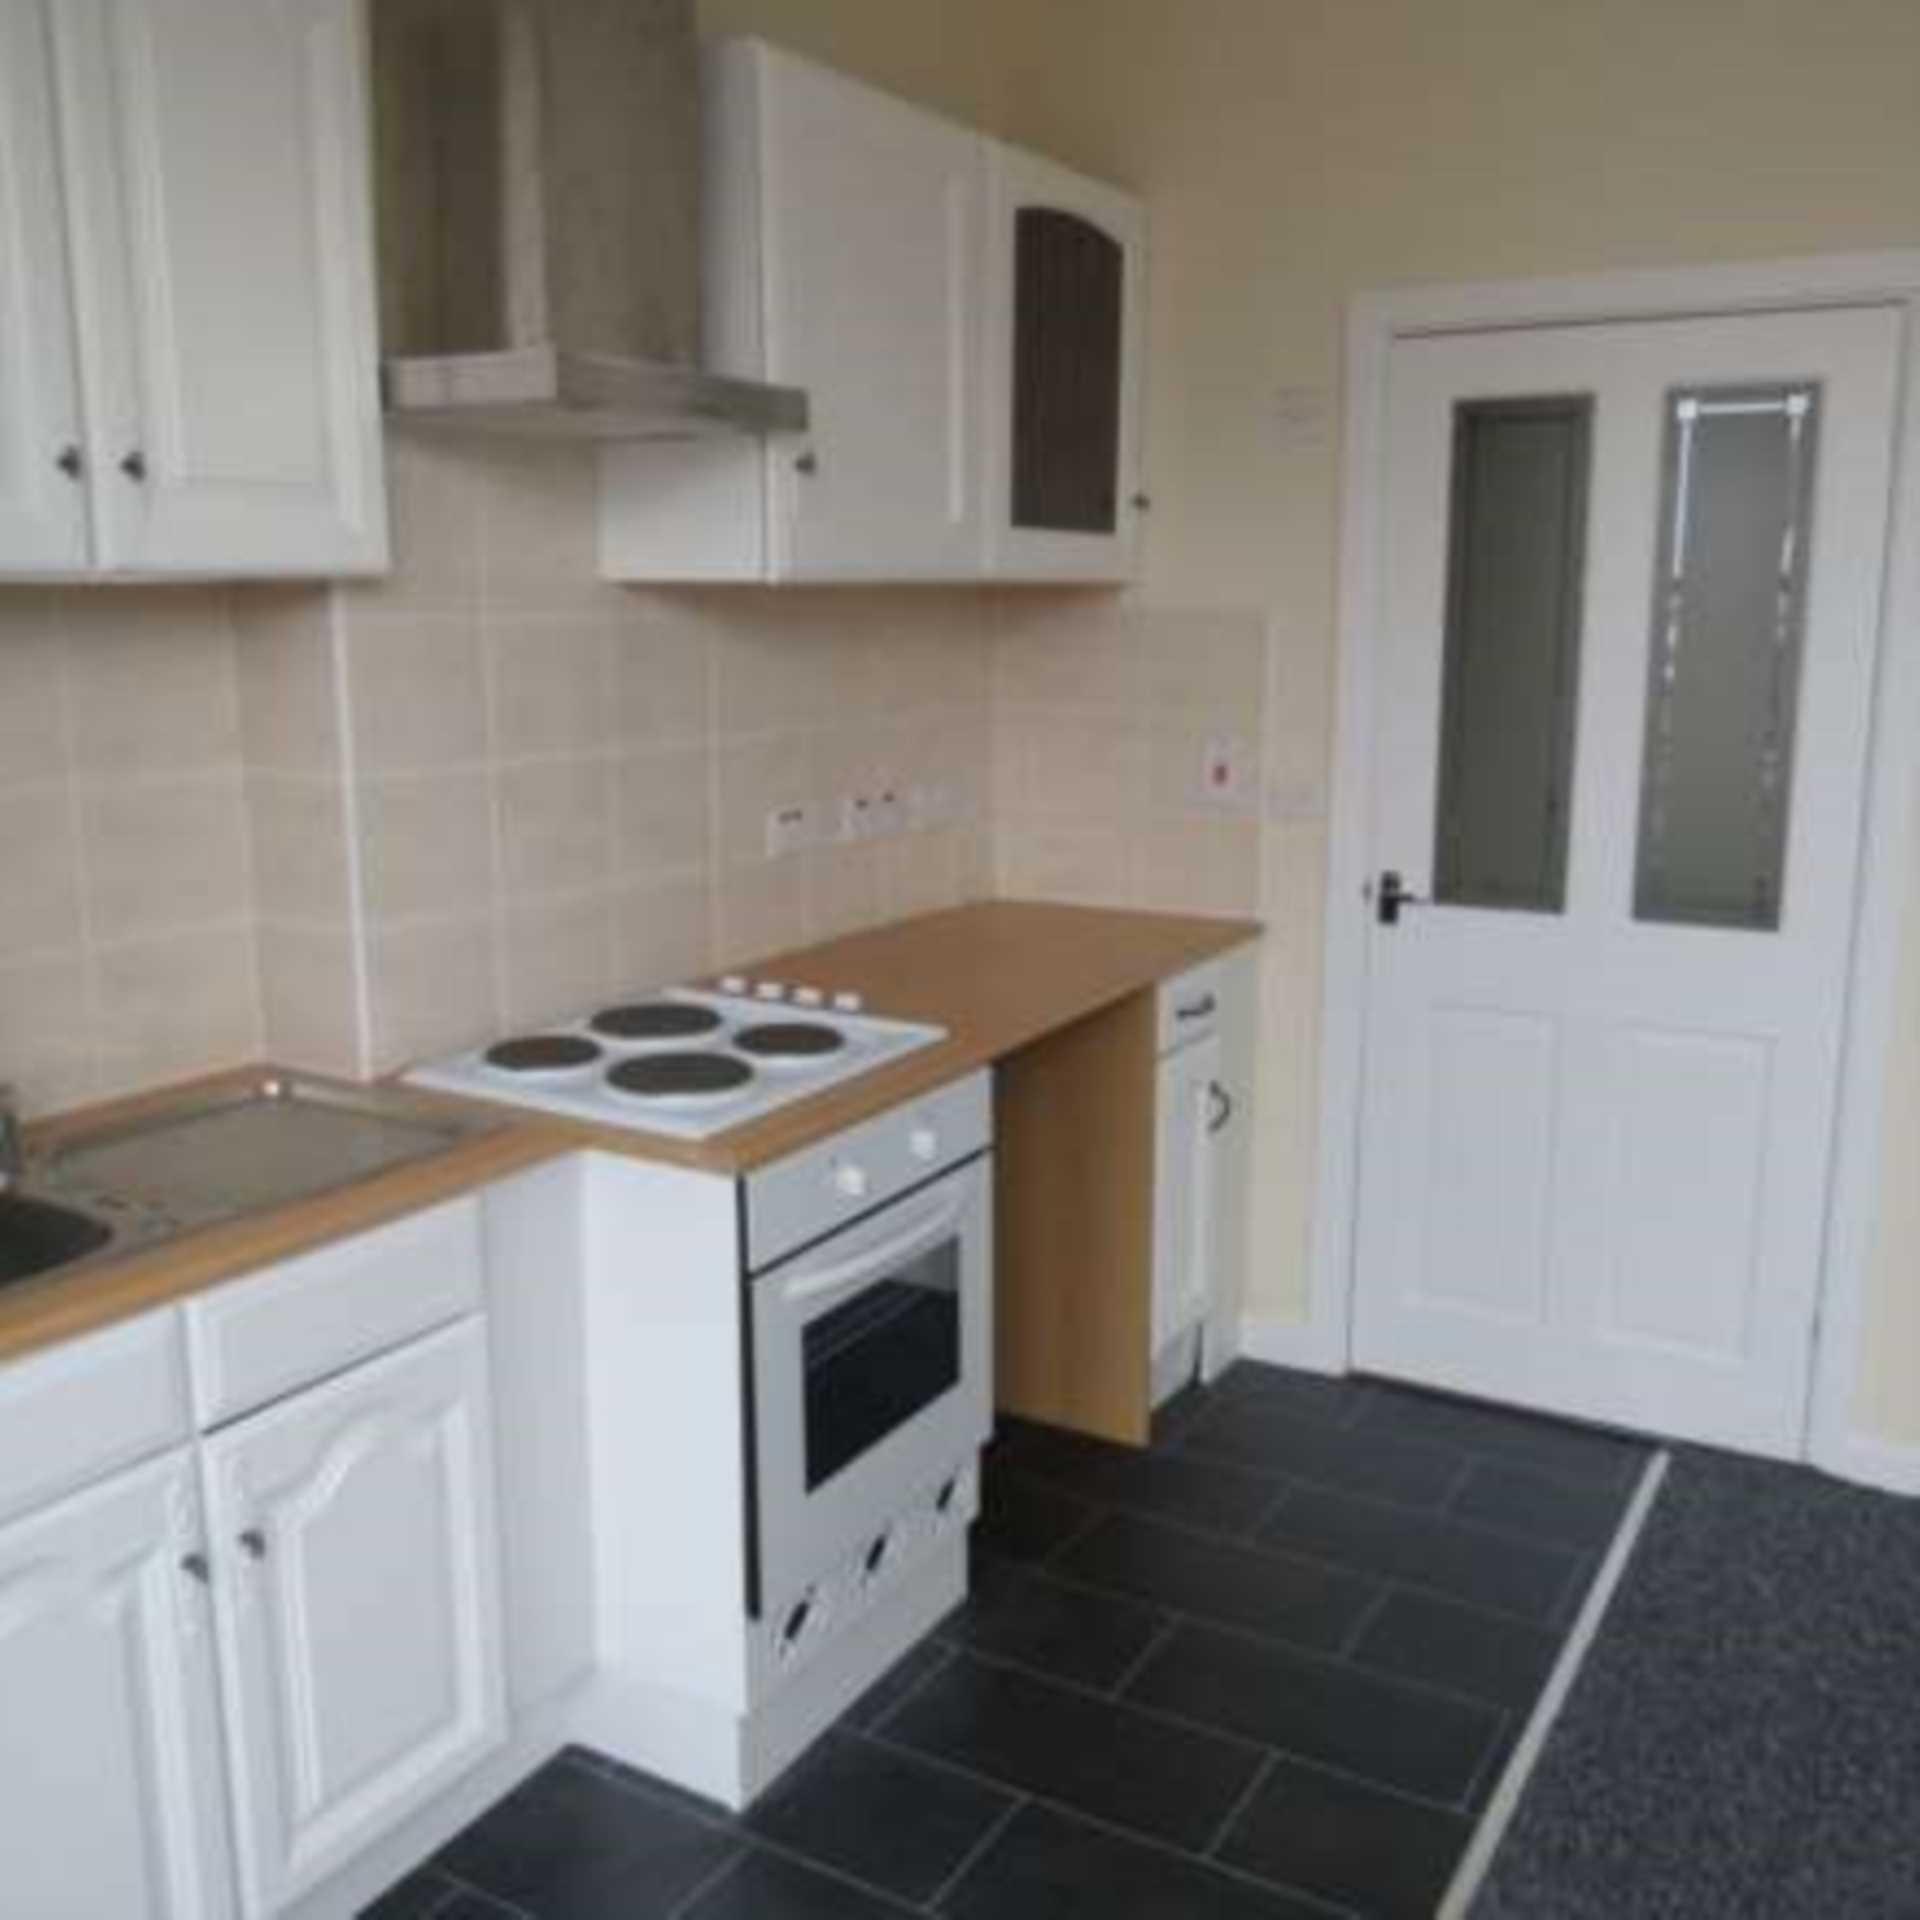 Flat Rental: 1 Bedroom Studio Flat To Rent, Holmfield Road, Blackpool